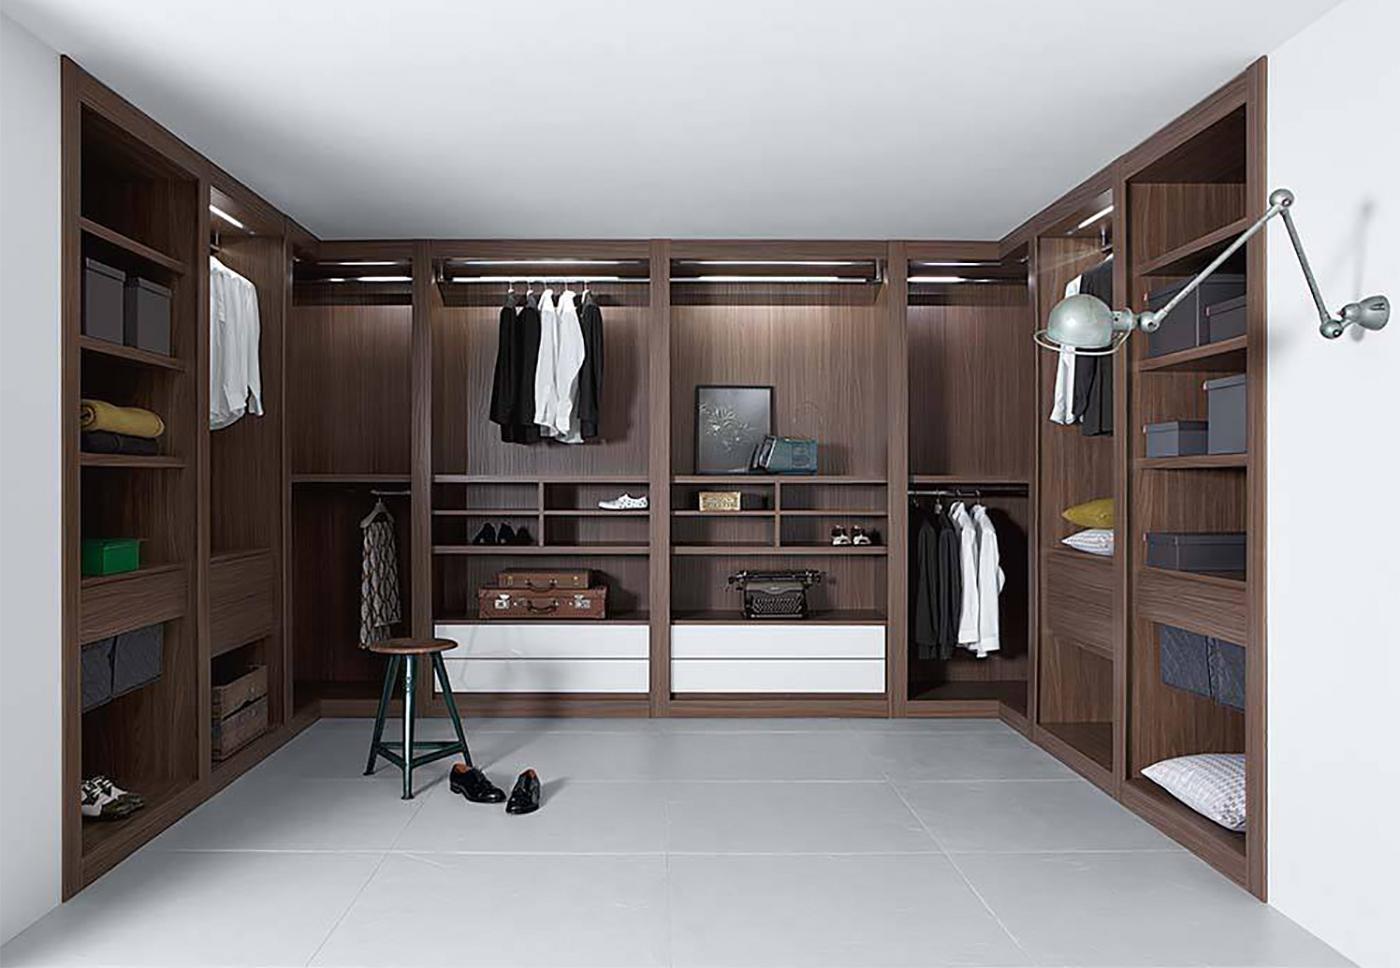 Freestanding custom closet